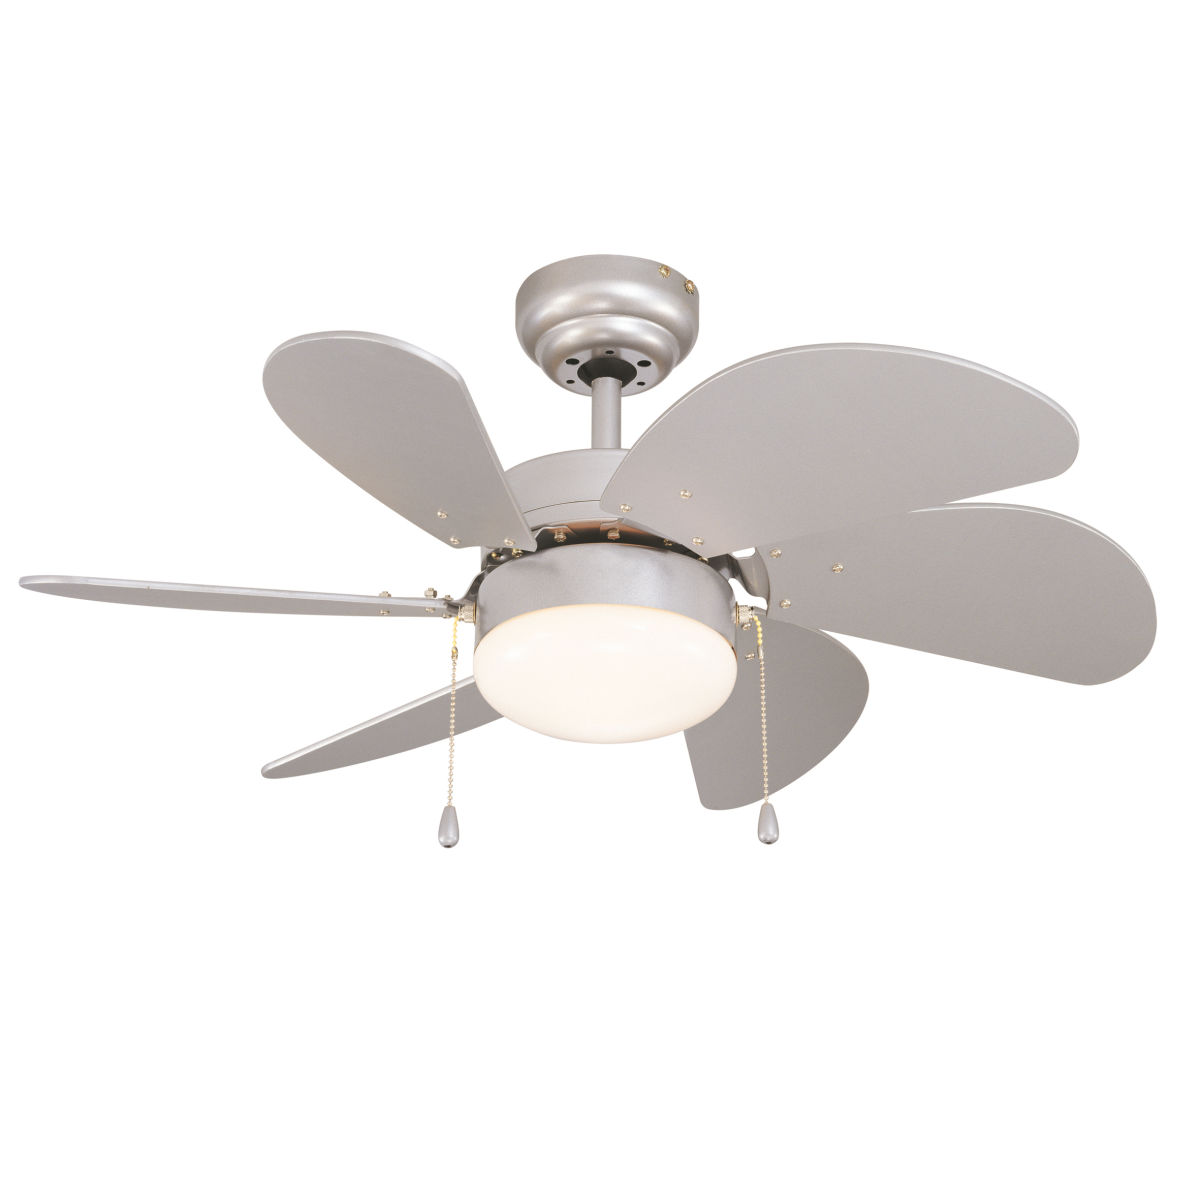 Lampadario A Pale Leroy Merlin.Ventilatore Da Soffitto Con Telecomando Leroy Merlin